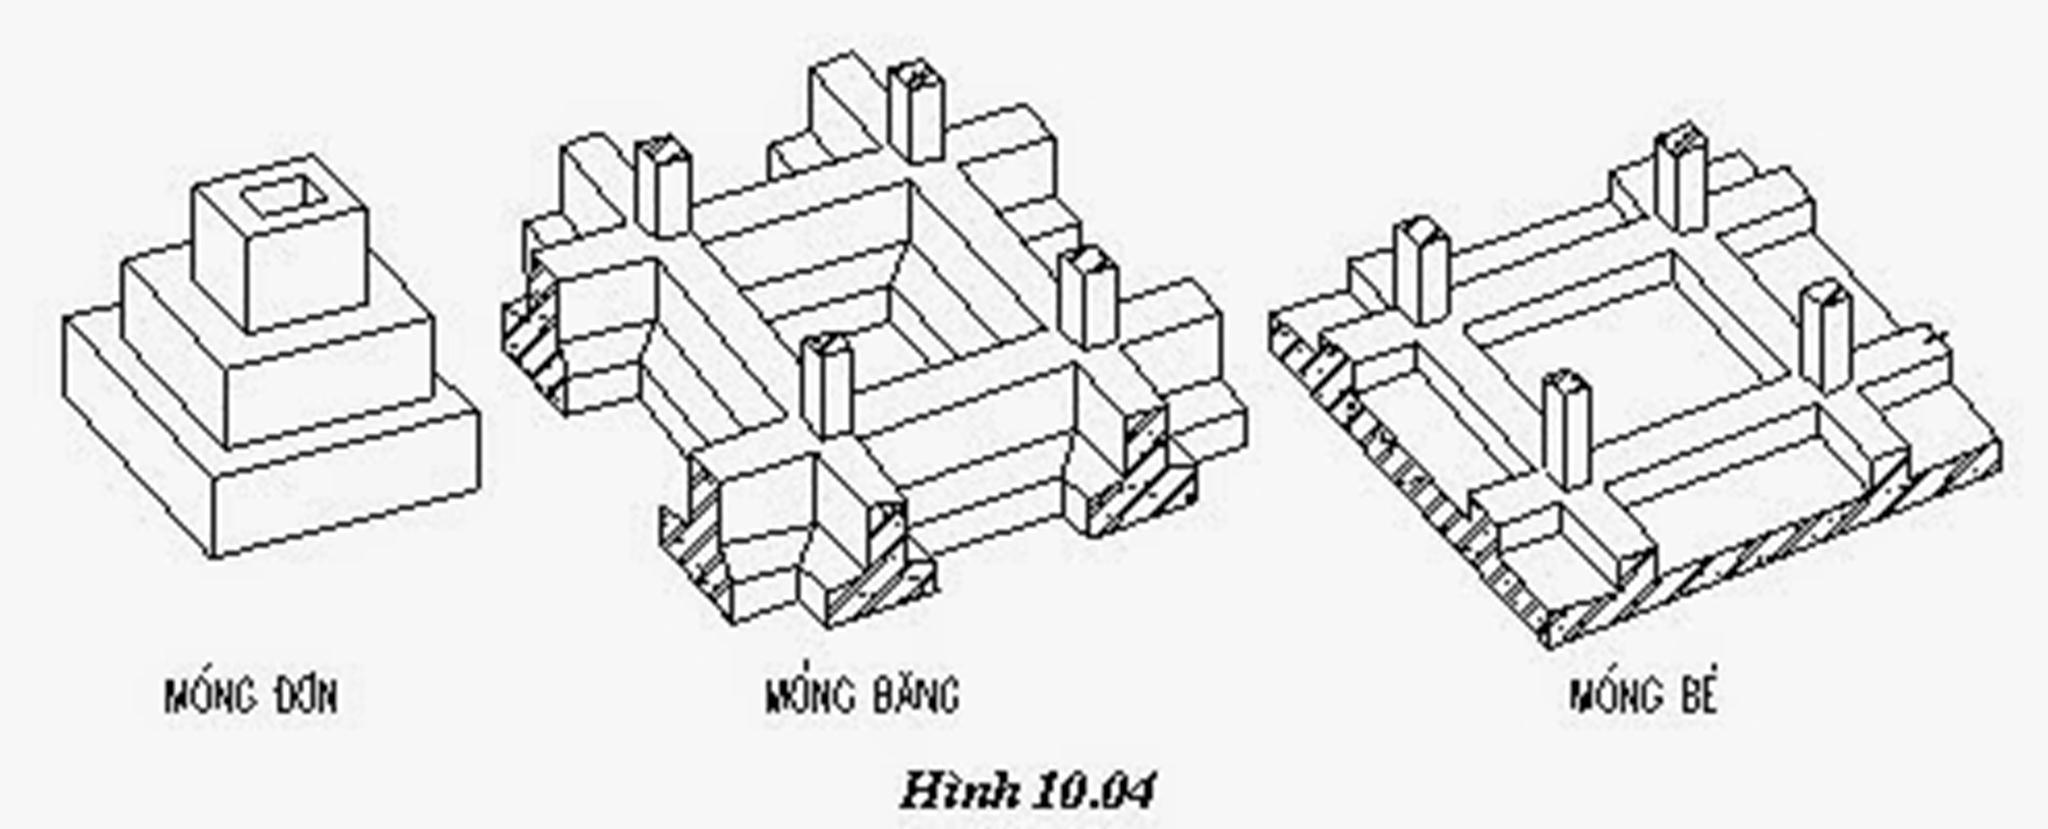 hinh1004-Copy.jpg